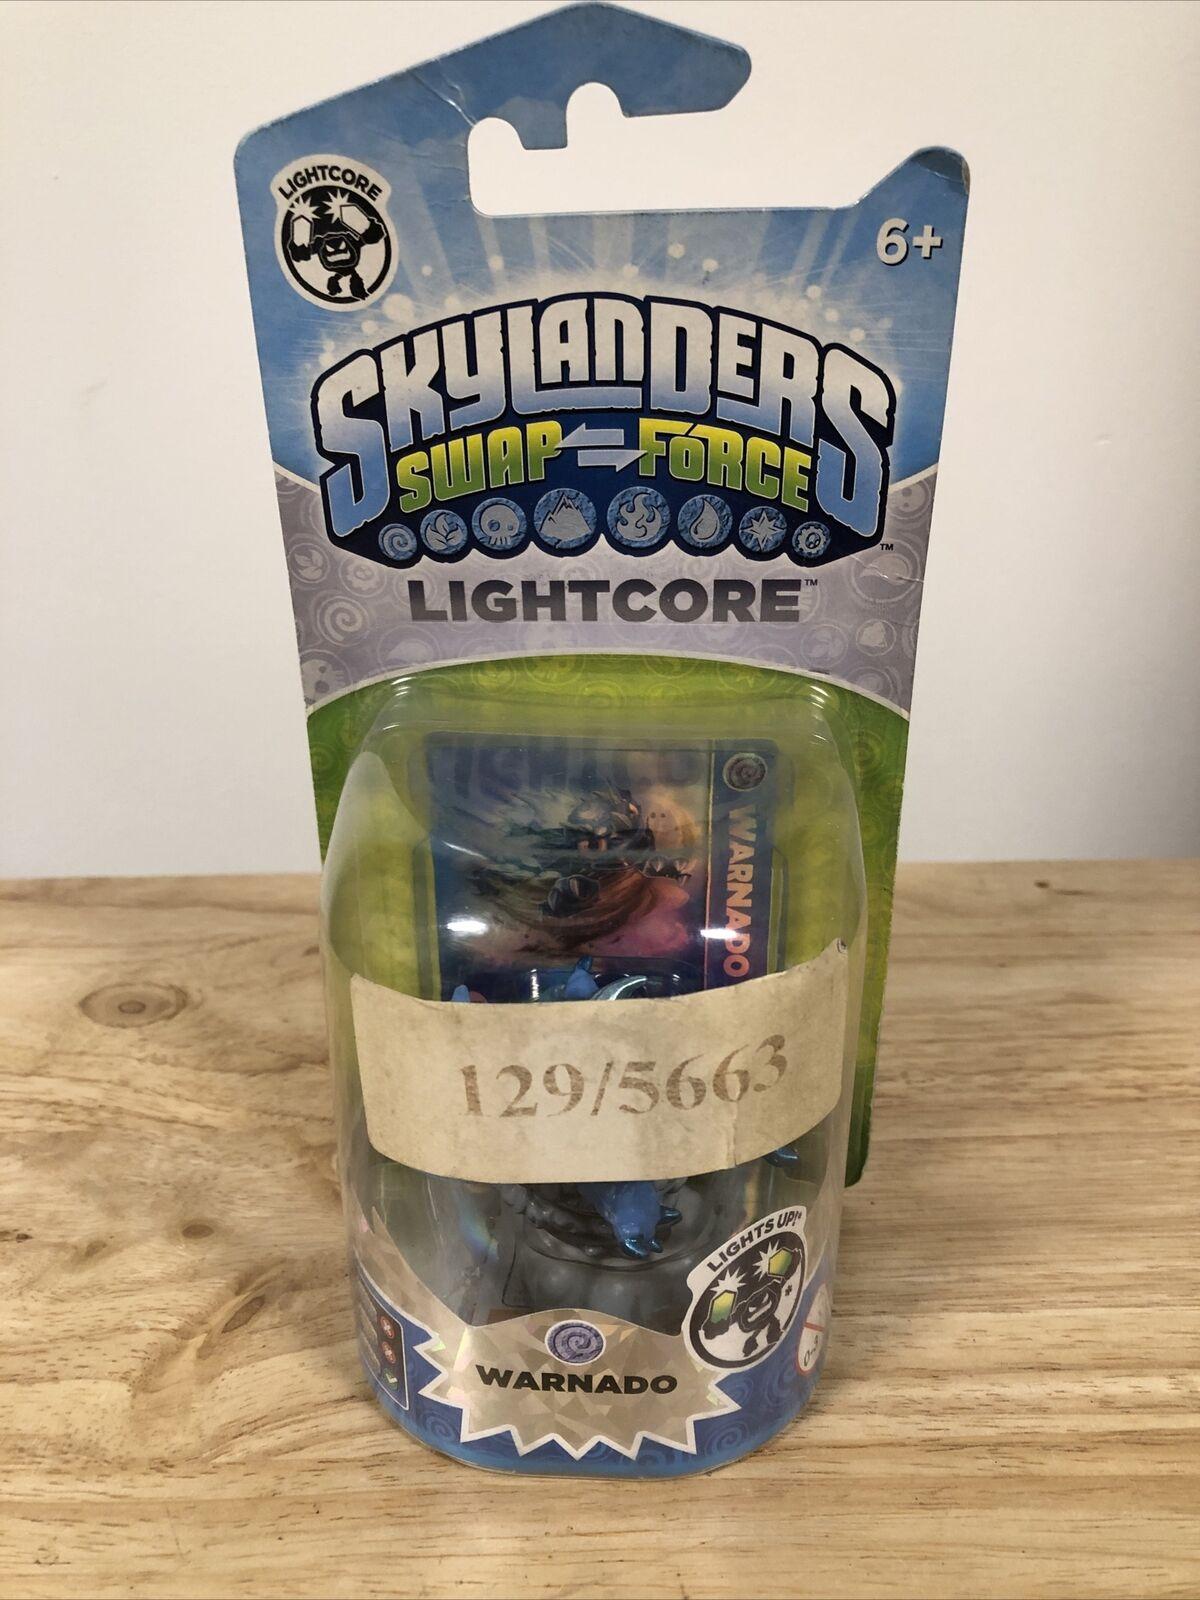 Skylanders Swap Force - Light Core Character Pack - Warnado (Xbox 360/PS3/Ninten